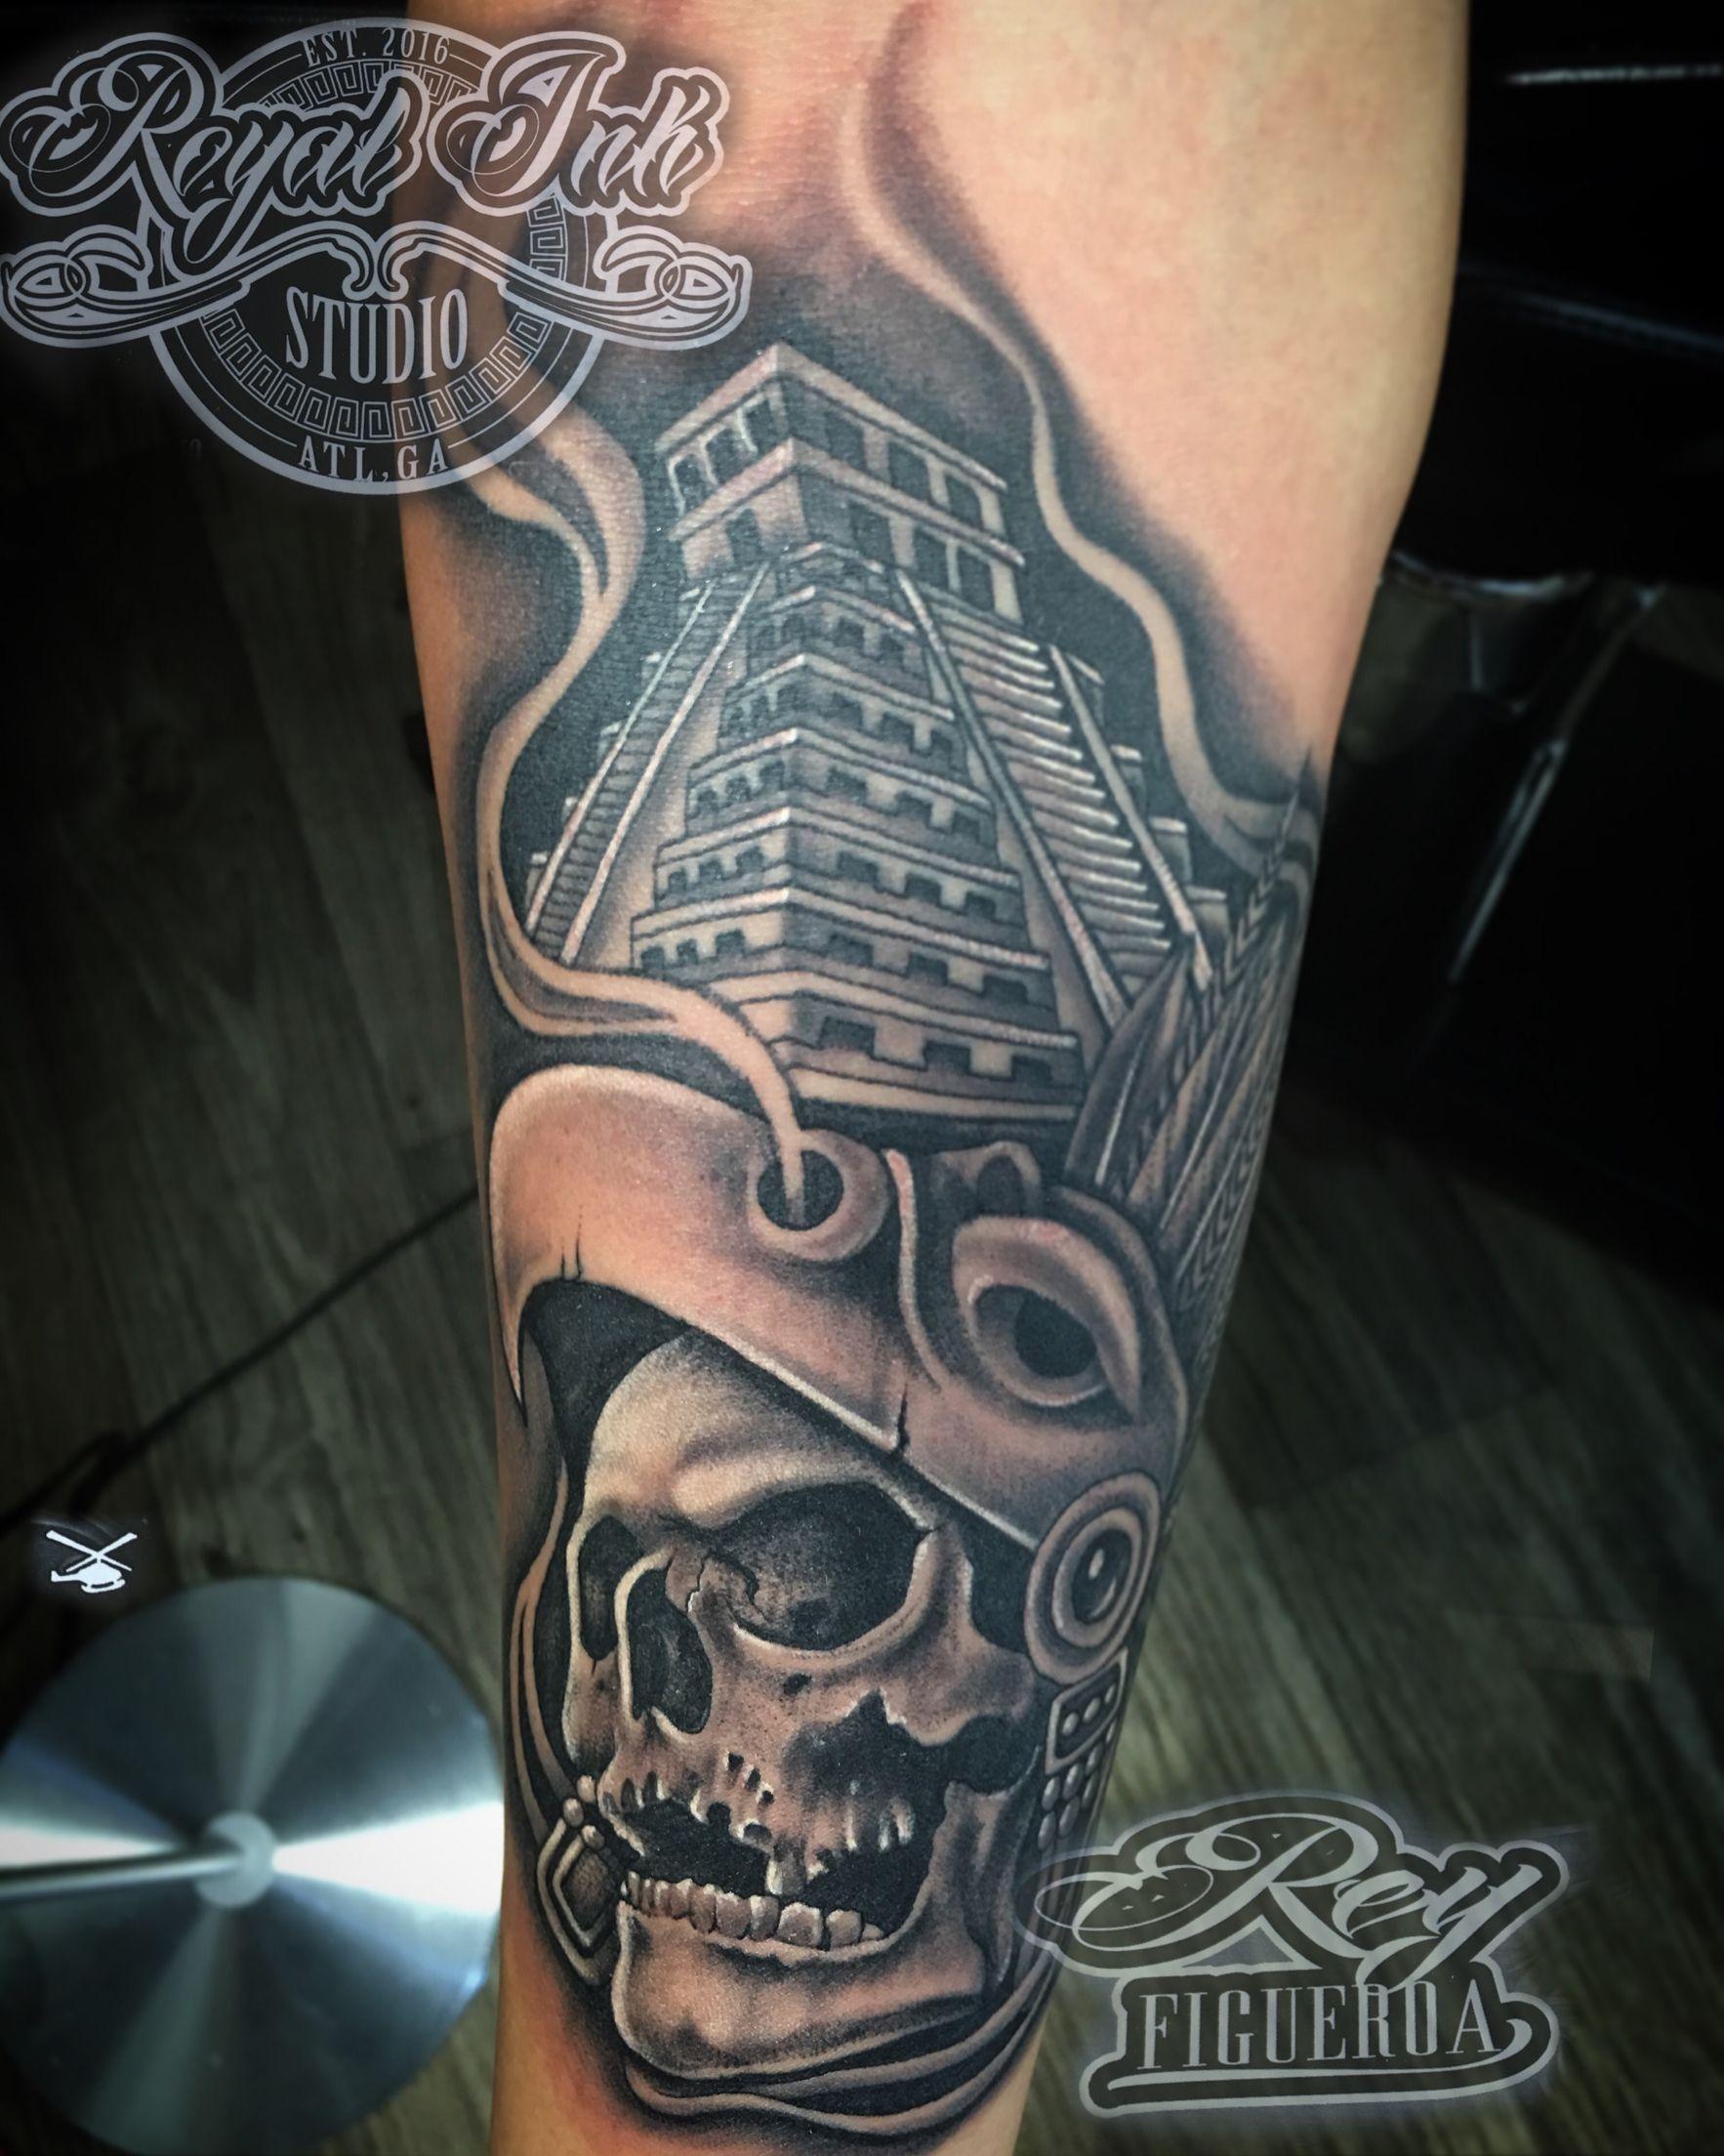 rey figueroa tattoos 1869 cobb pkwy s marietta ga 30060 ForBlack And Grey Tattoo Artists Near Me